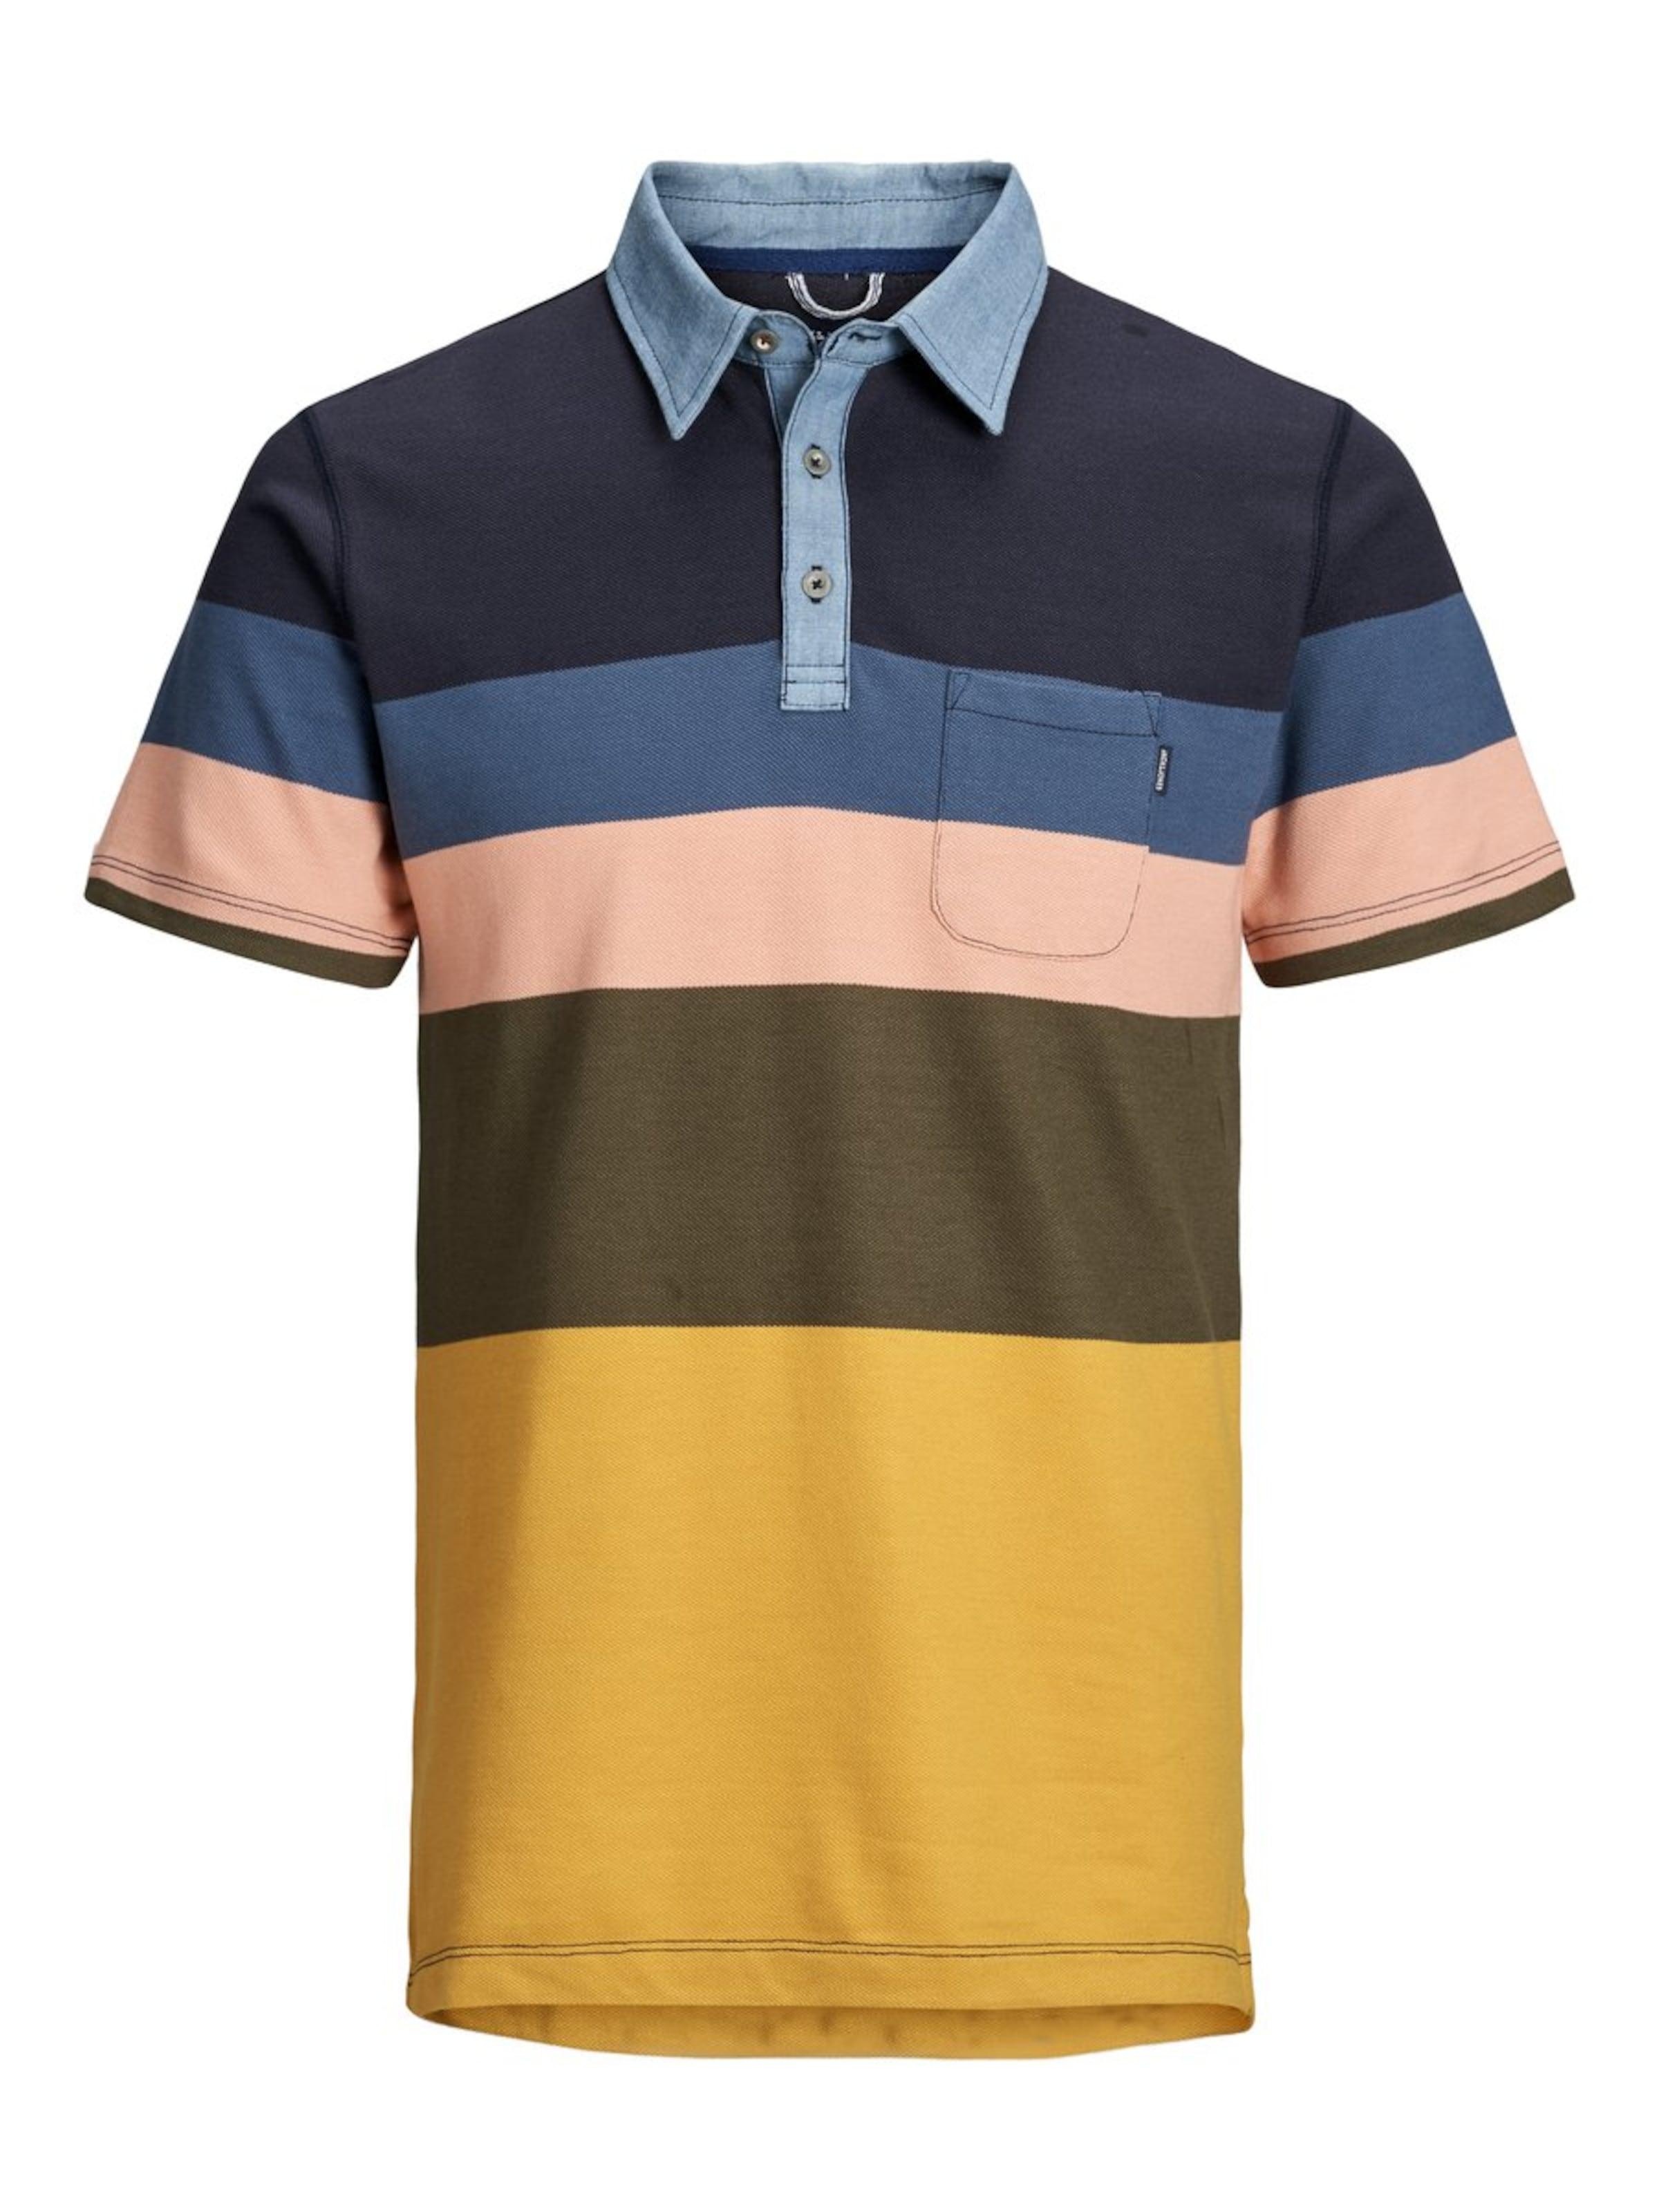 In Jackamp; Pfirsich Jones NachtblauHellblau Violettblau Khaki Gelb Poloshirt wTOkiPXZu